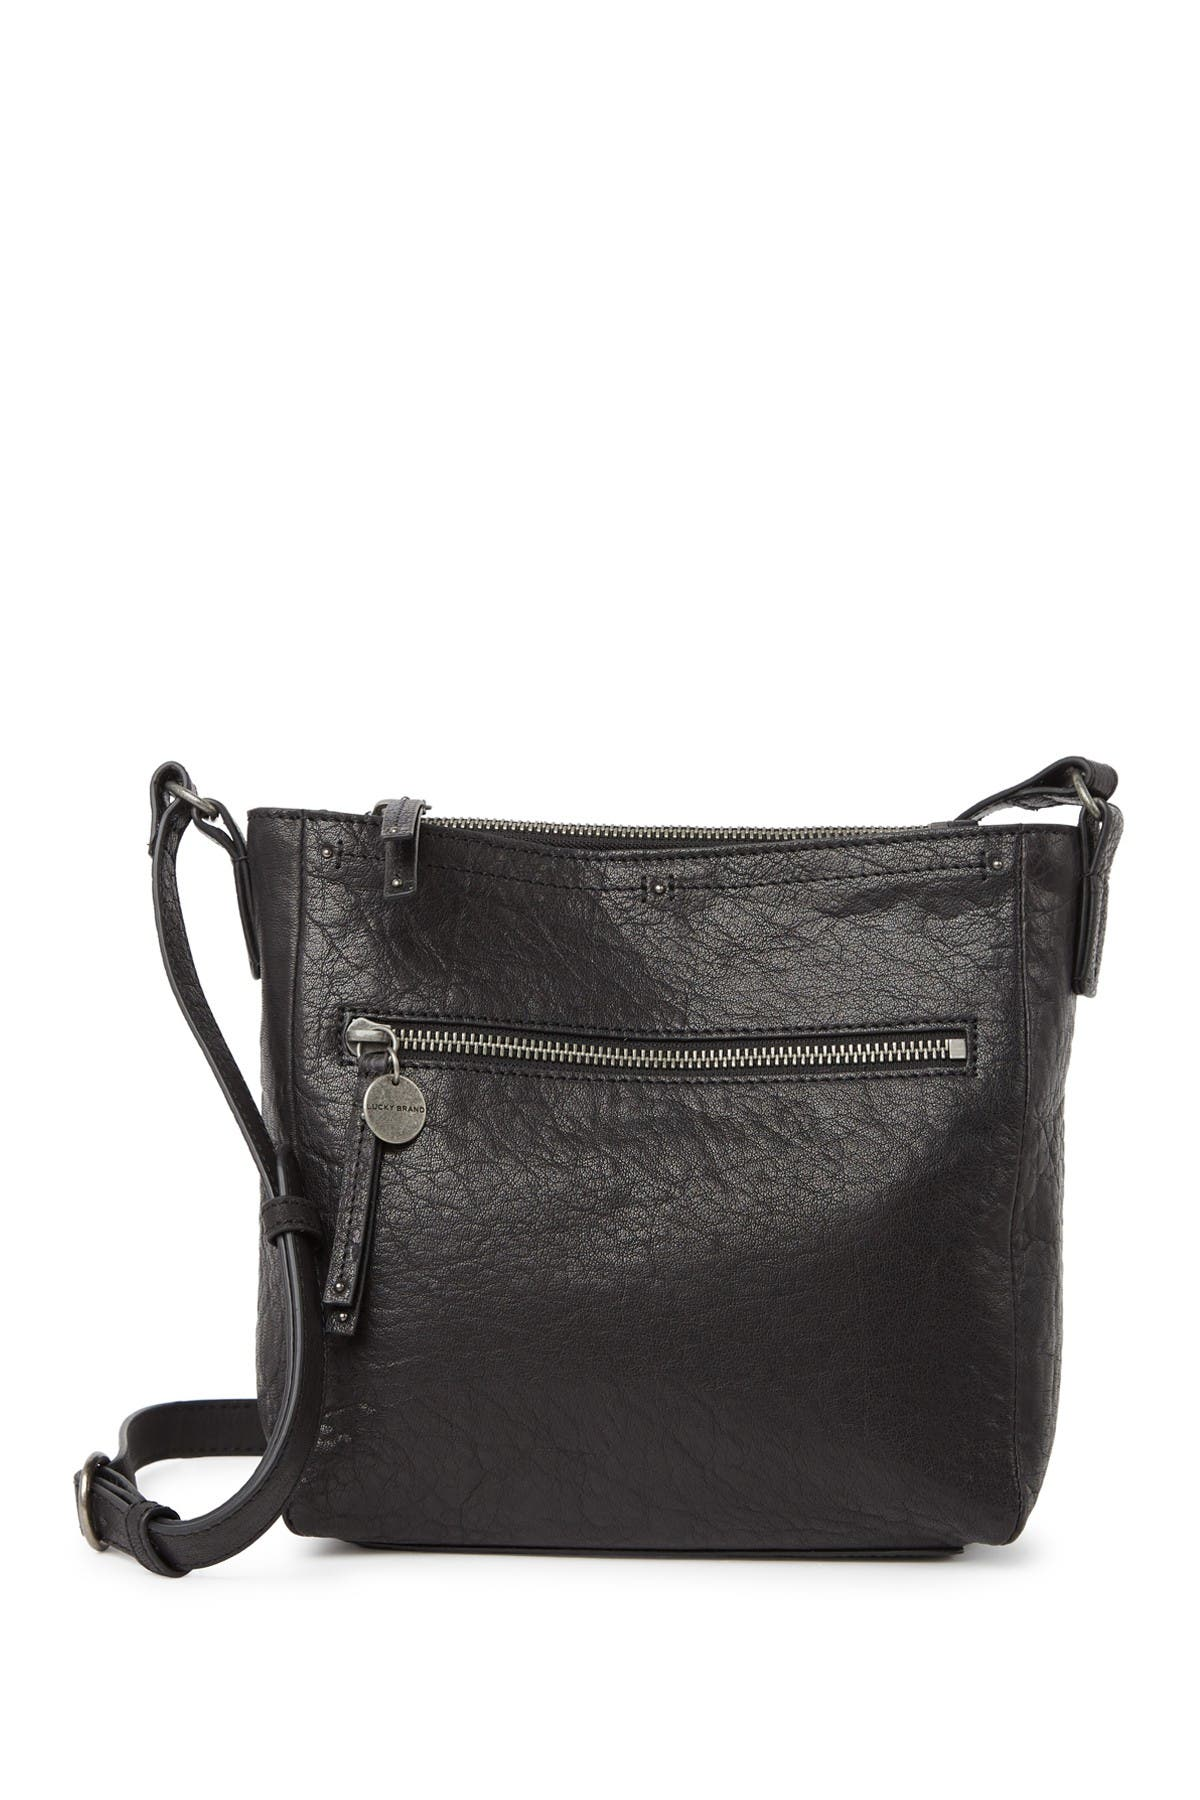 Image of Lucky Brand Eddo Crossbody Bag